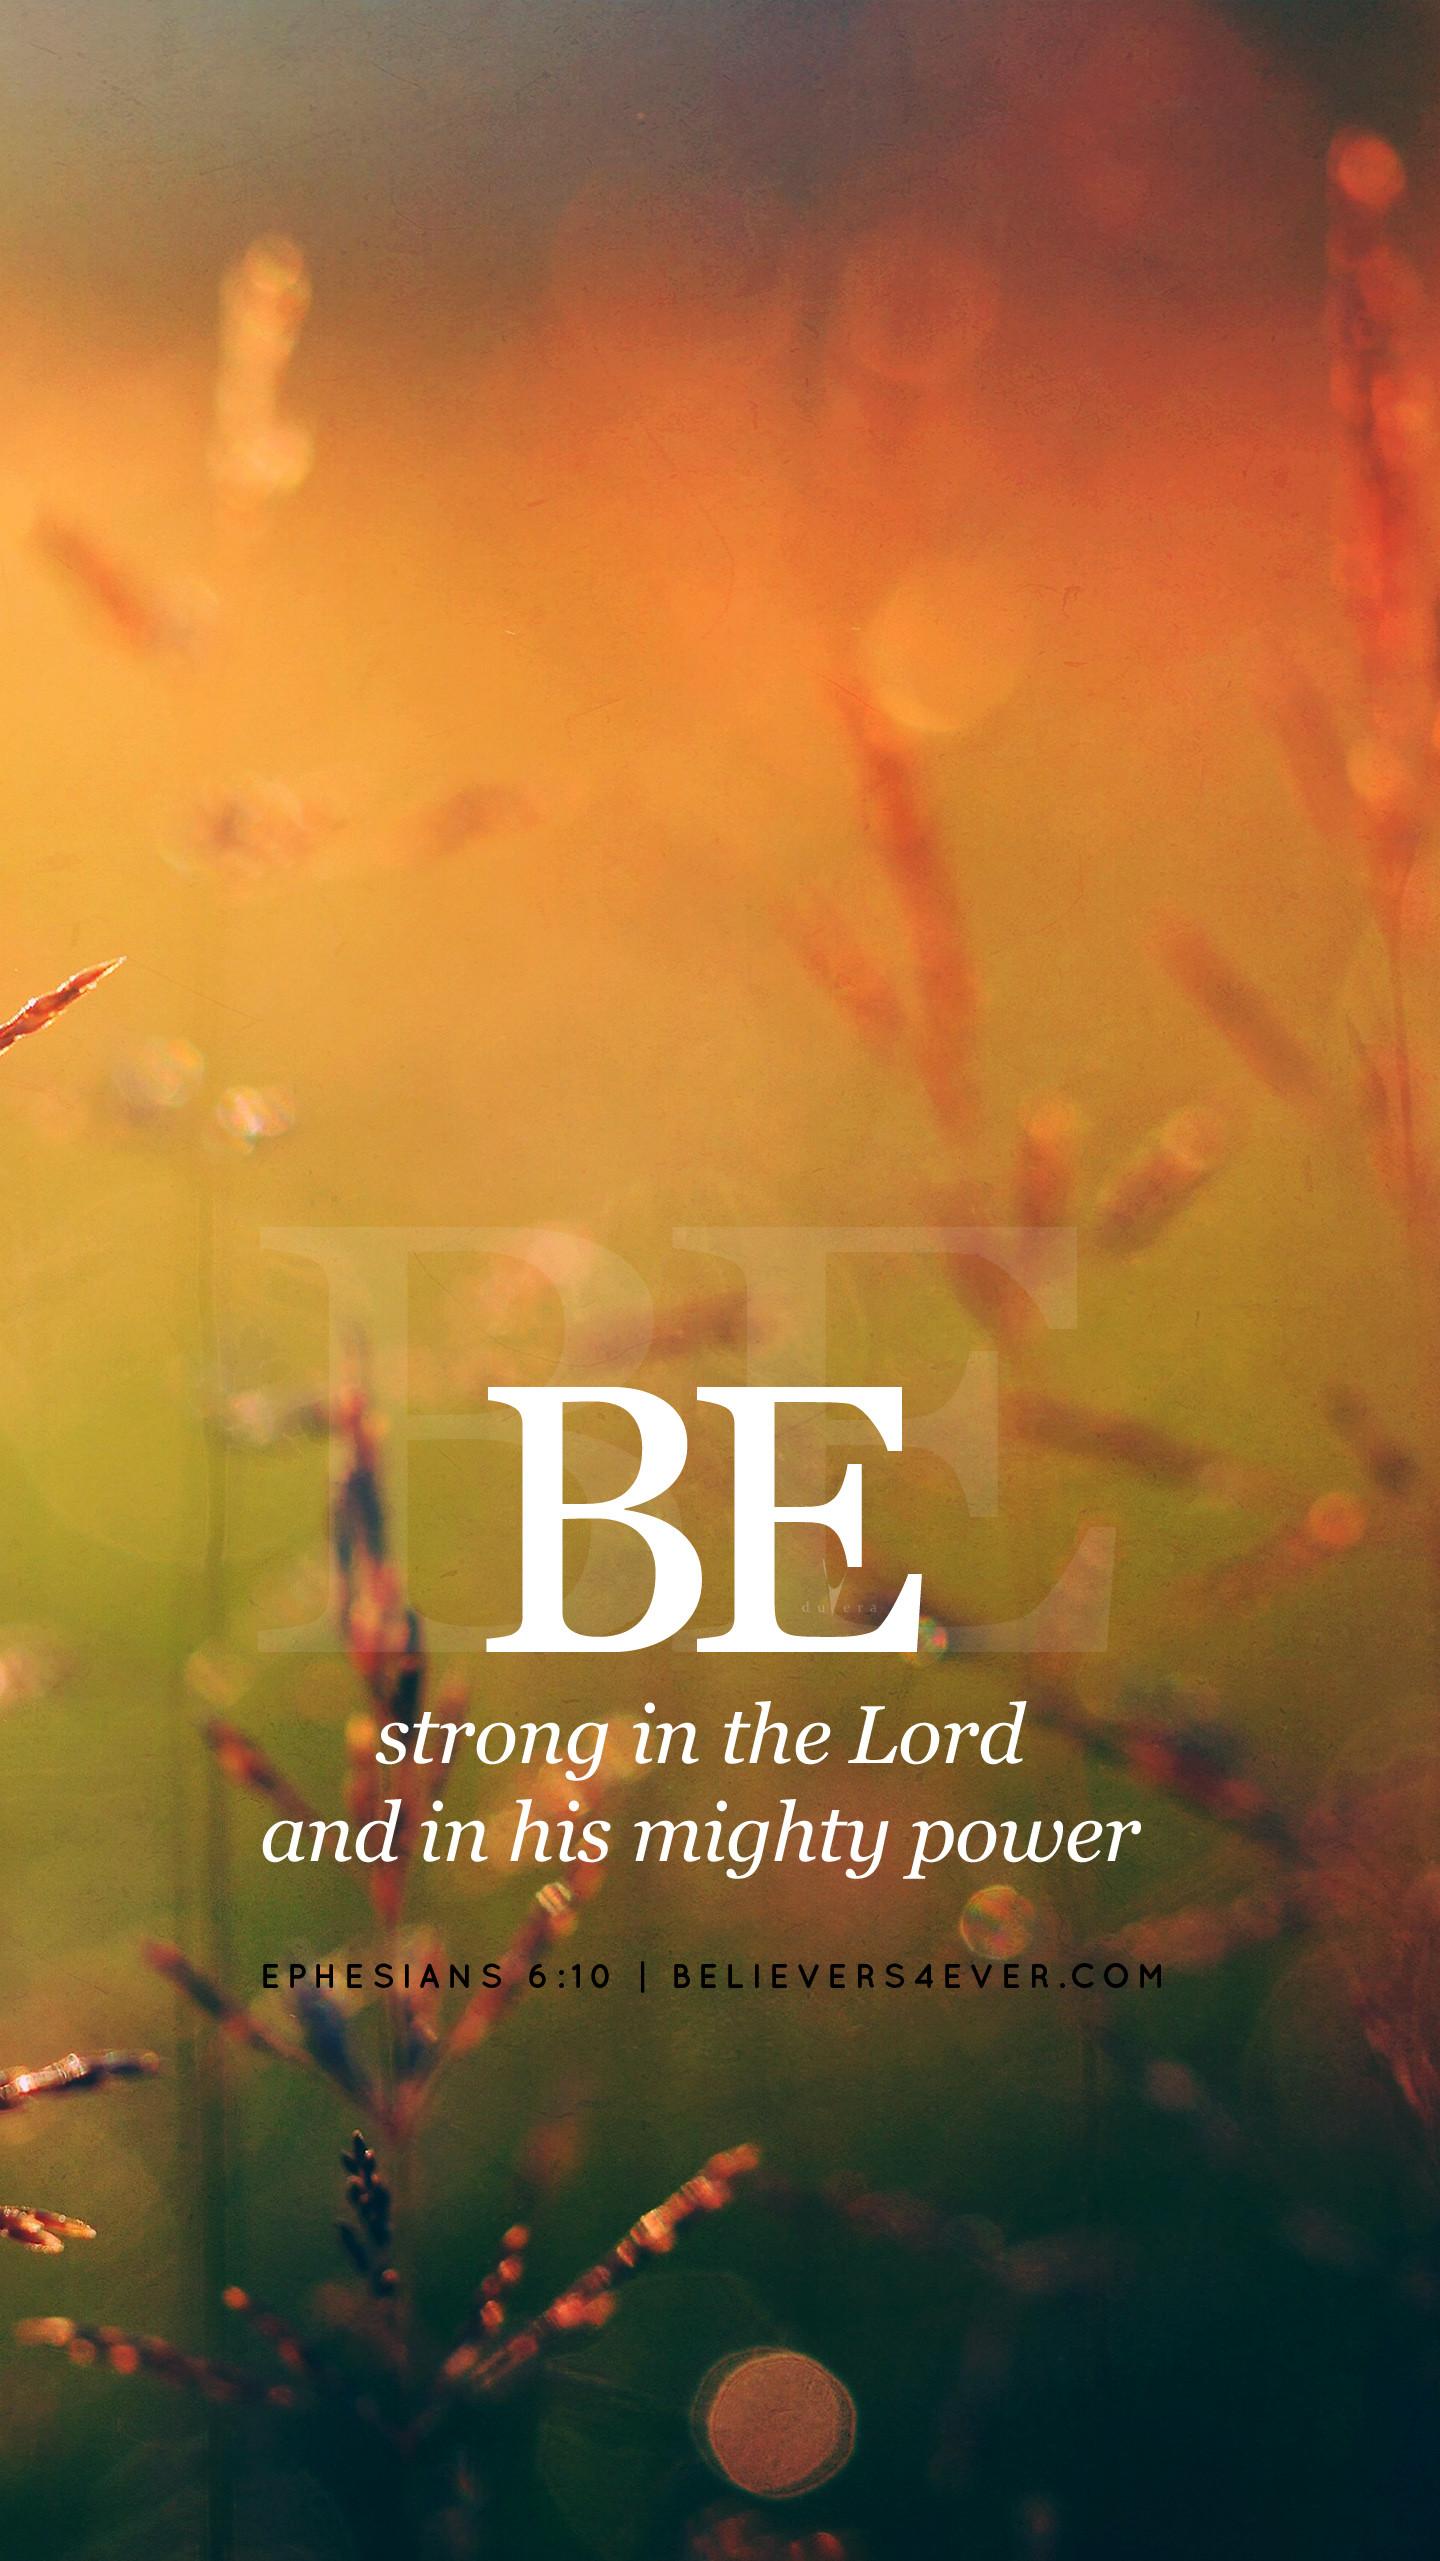 Inspirational Bible Verses Wallpaper (45+ Images